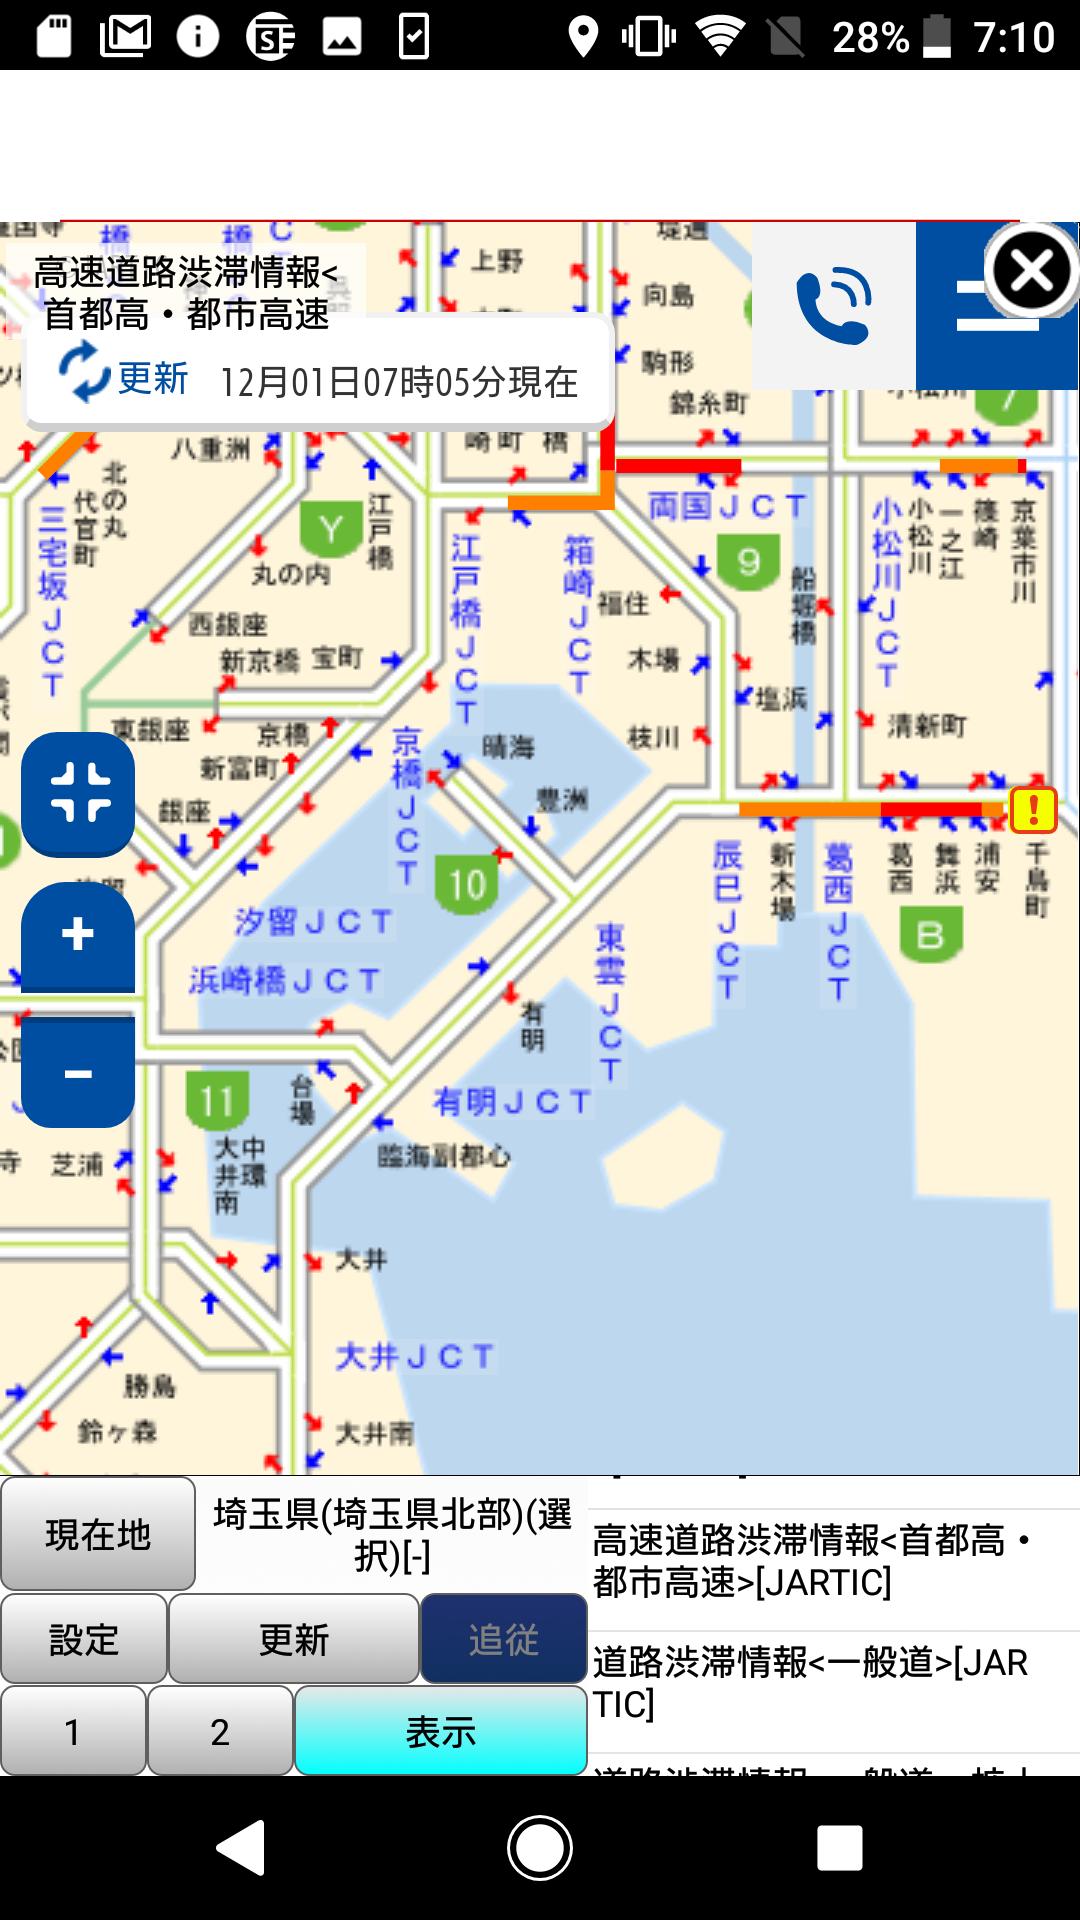 Androidツール・交通アプリ「周辺便利渋滞情報」画面2